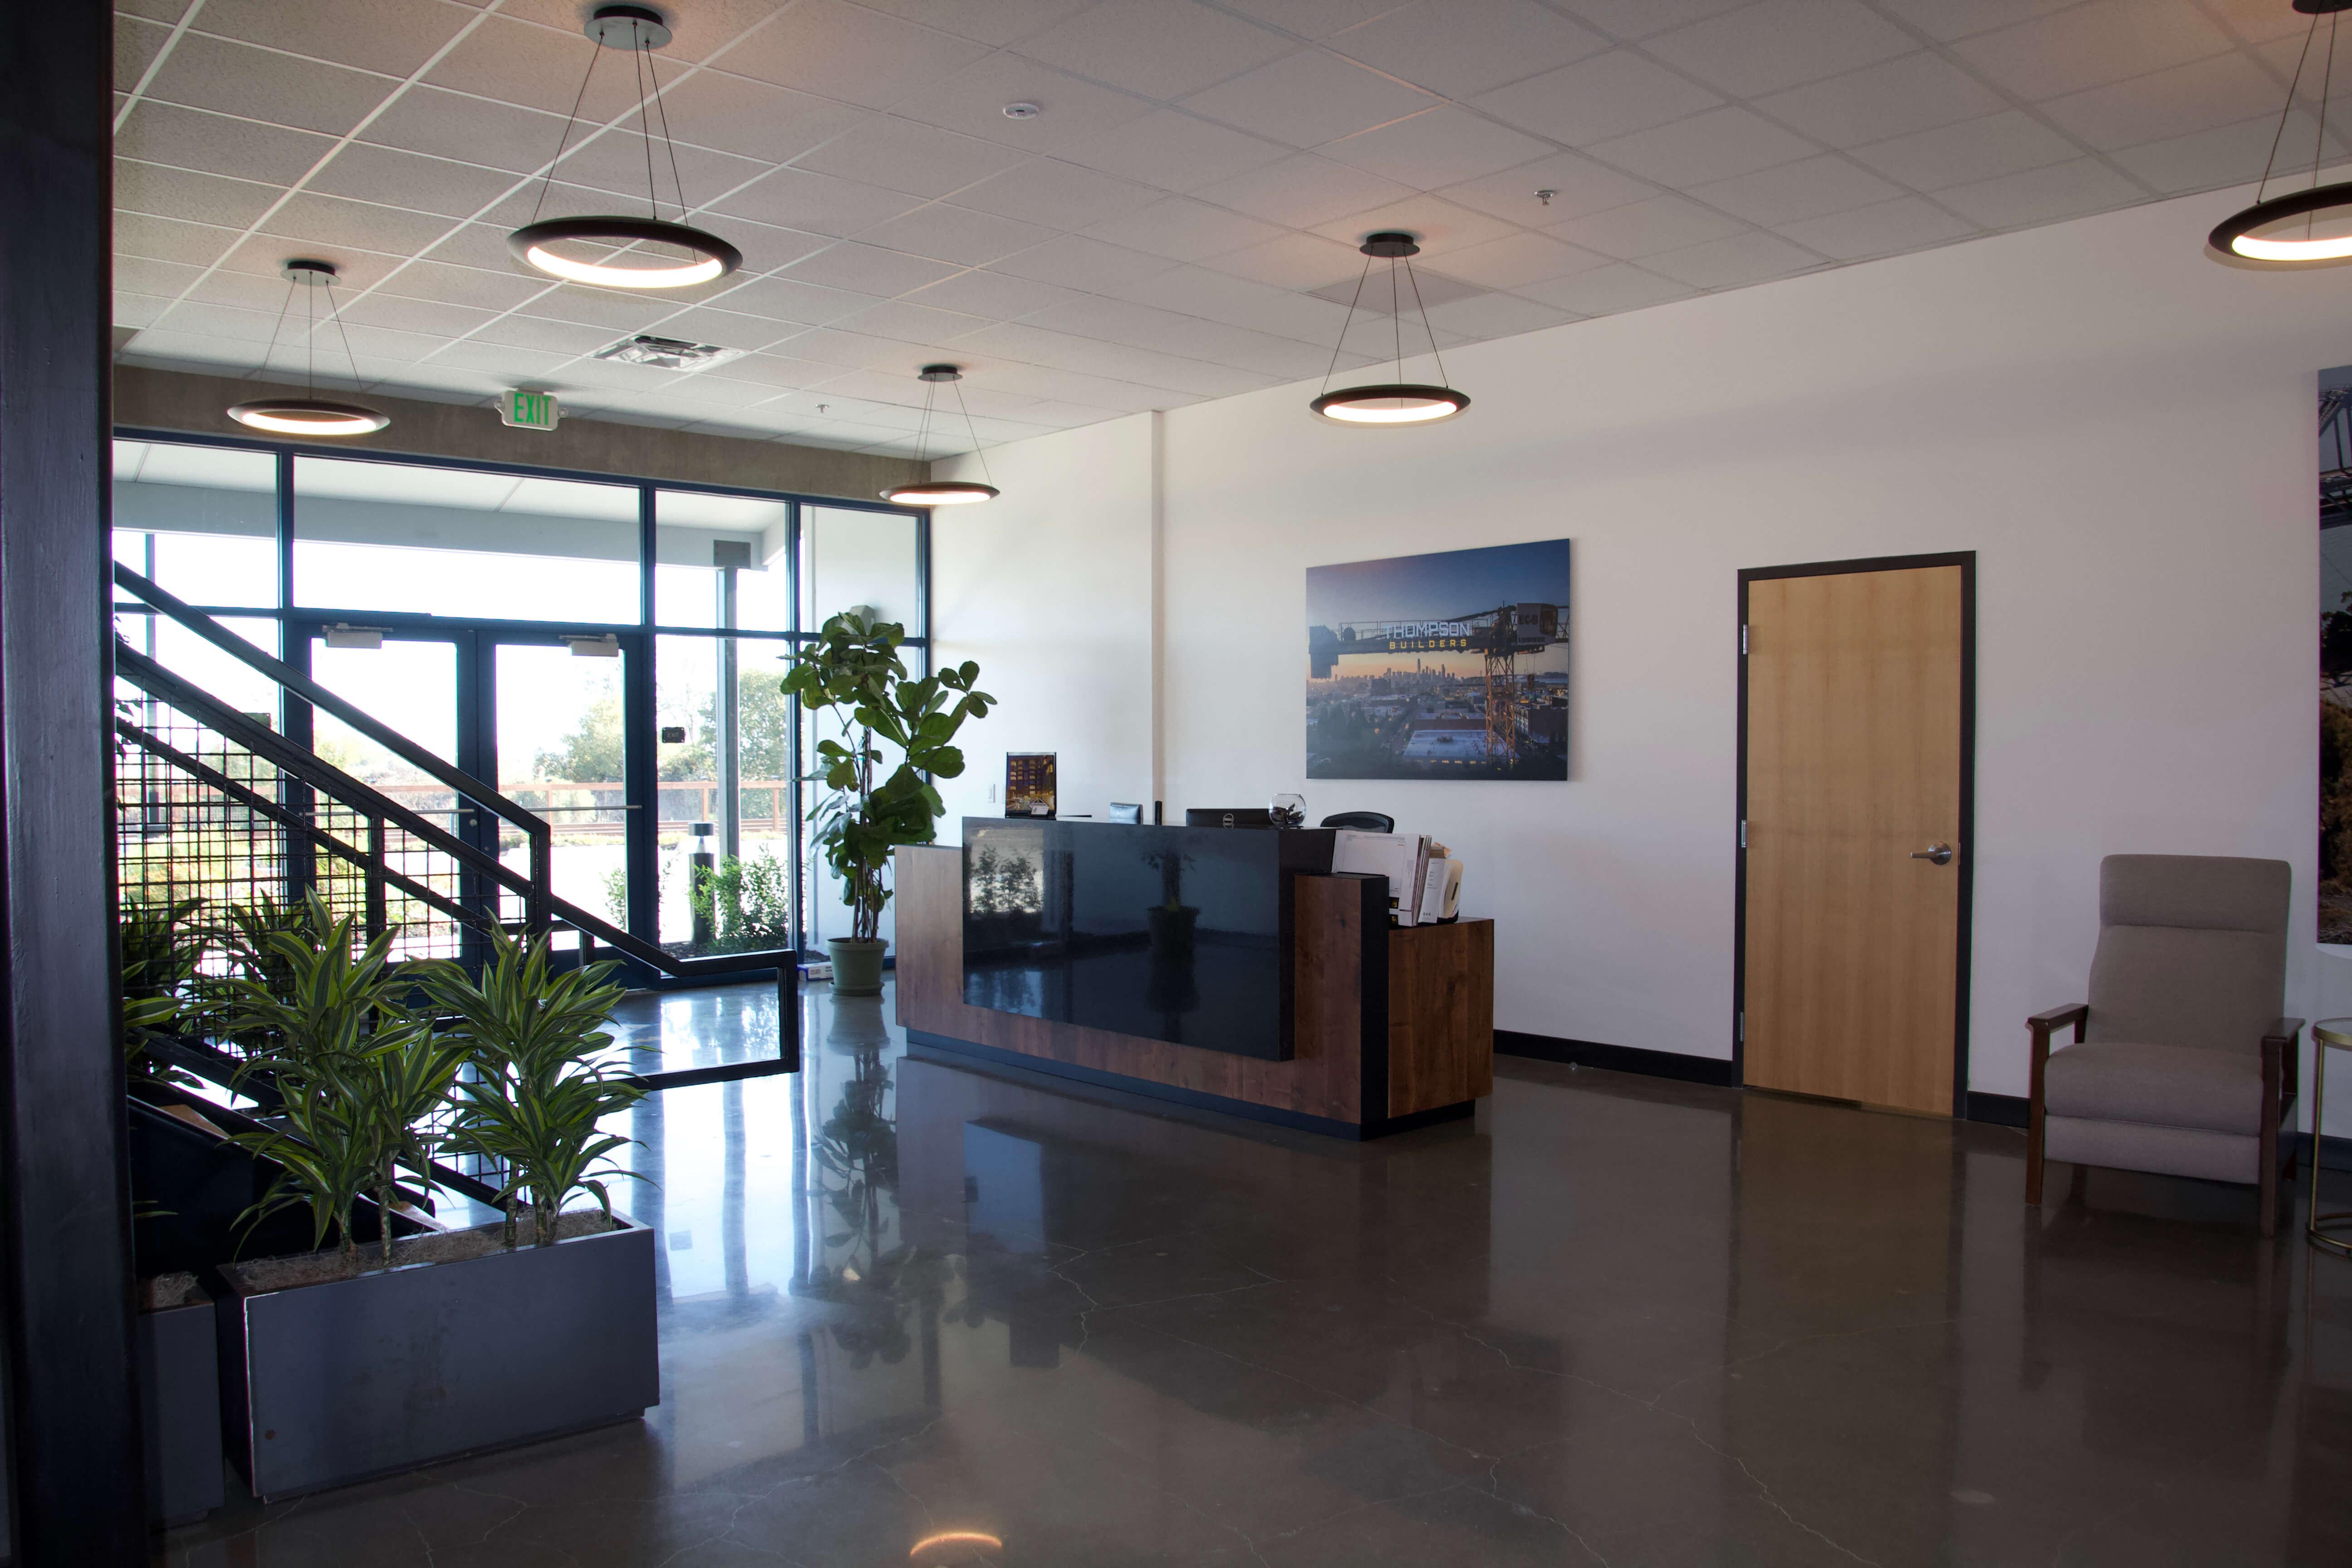 8.Lobby View